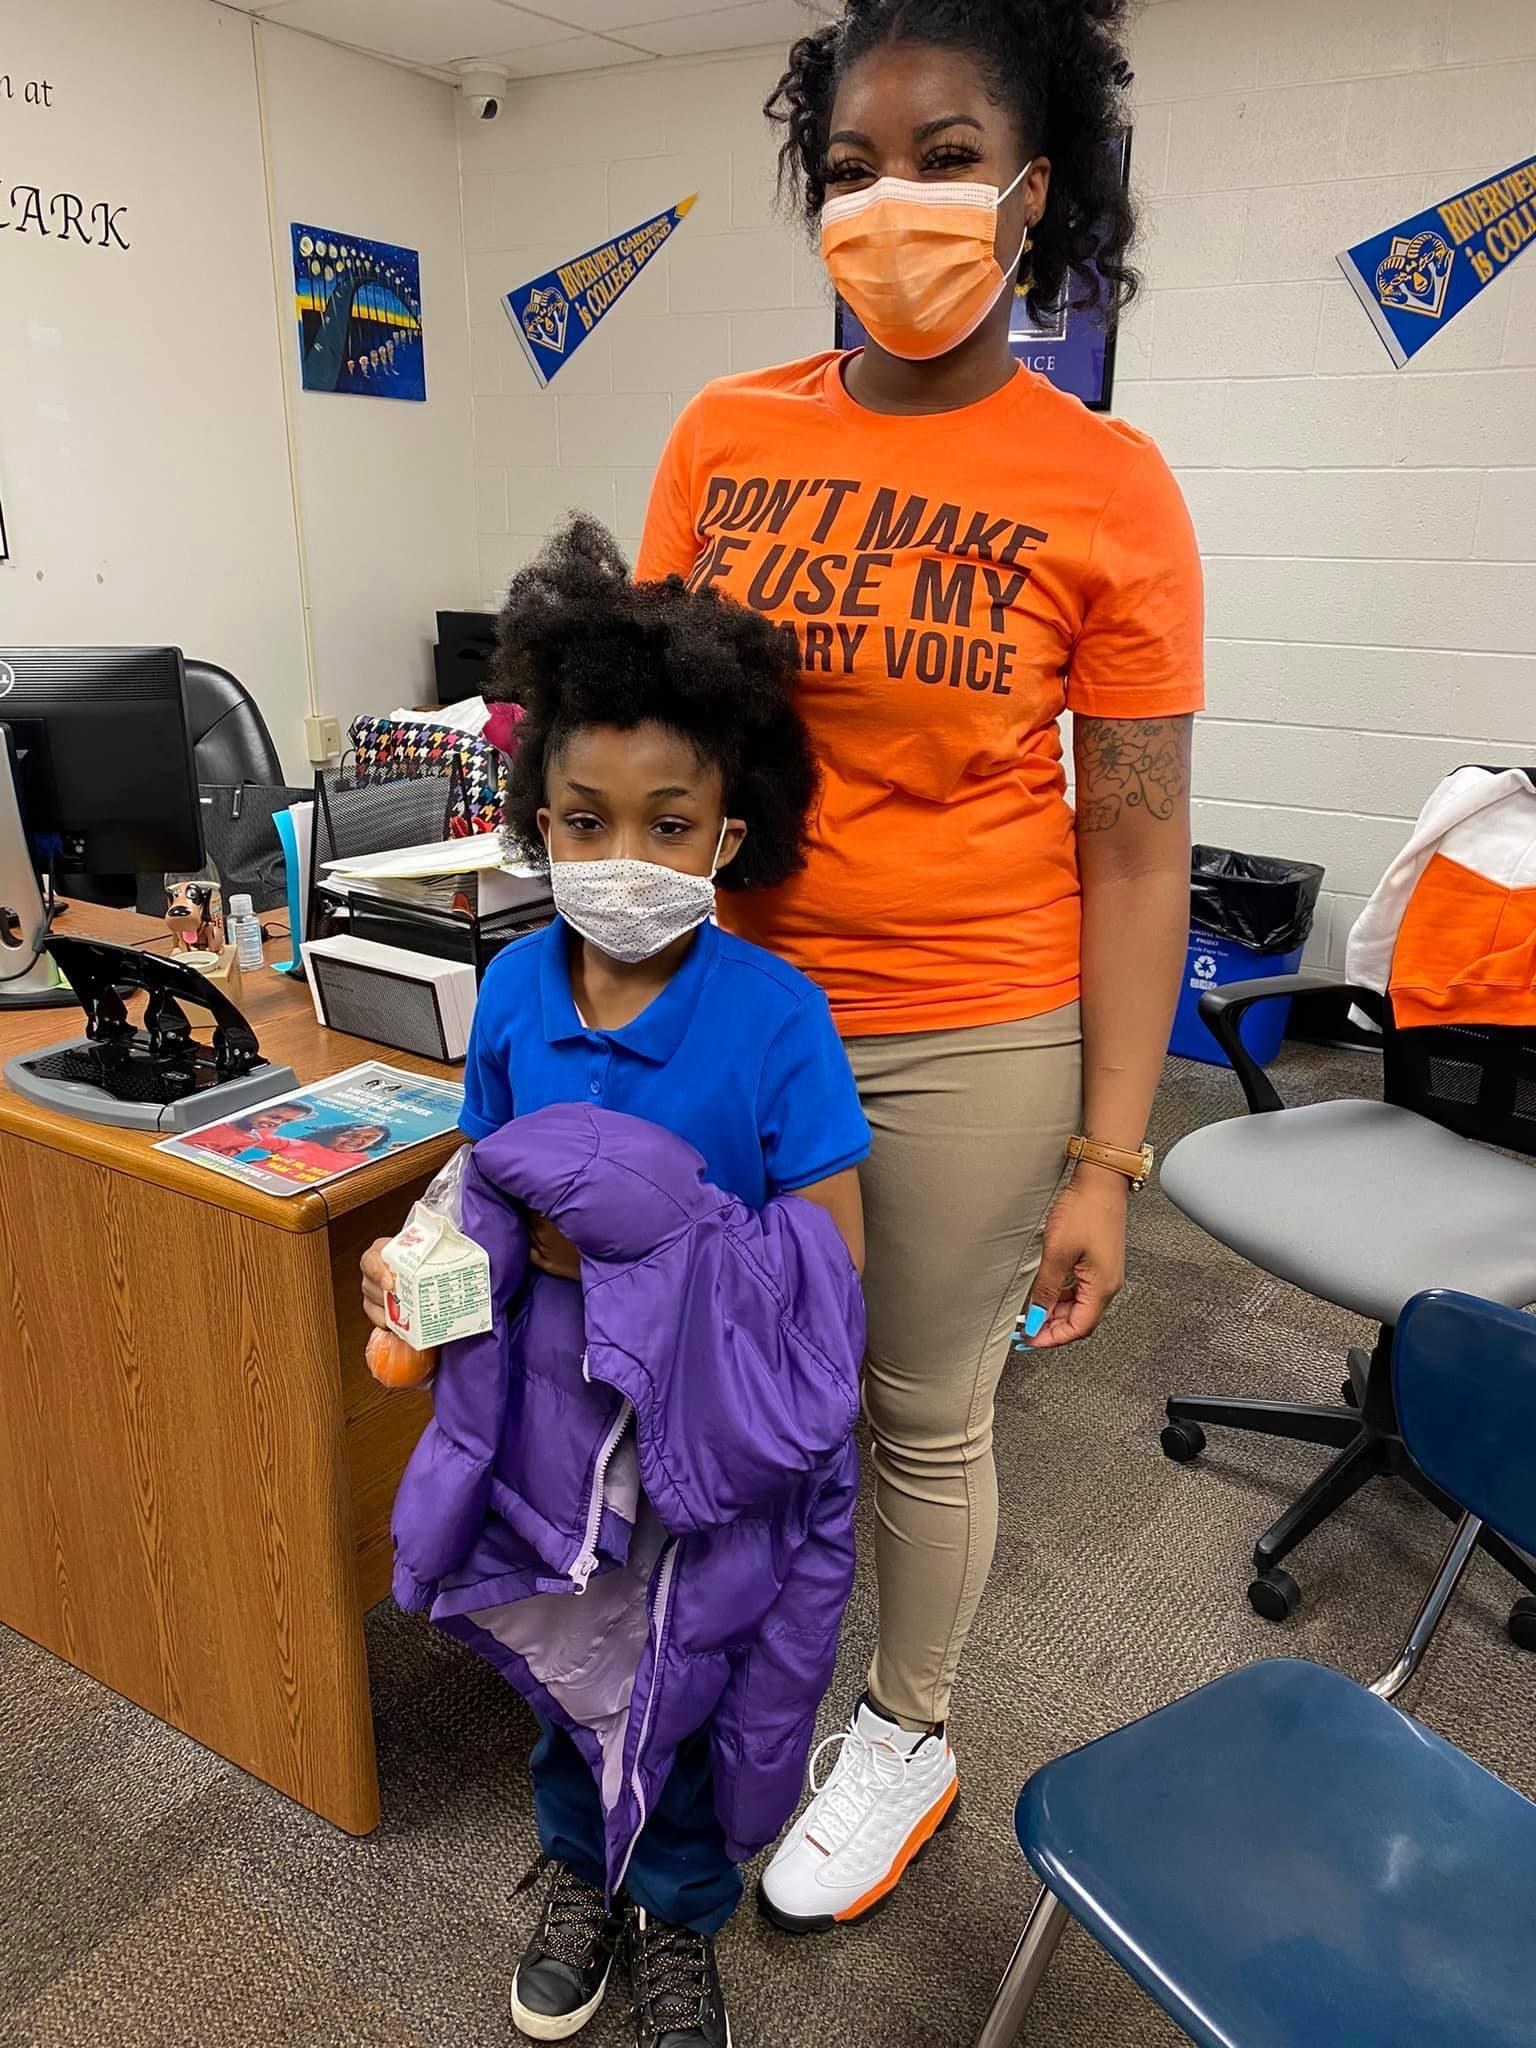 Ms. Farmer & student